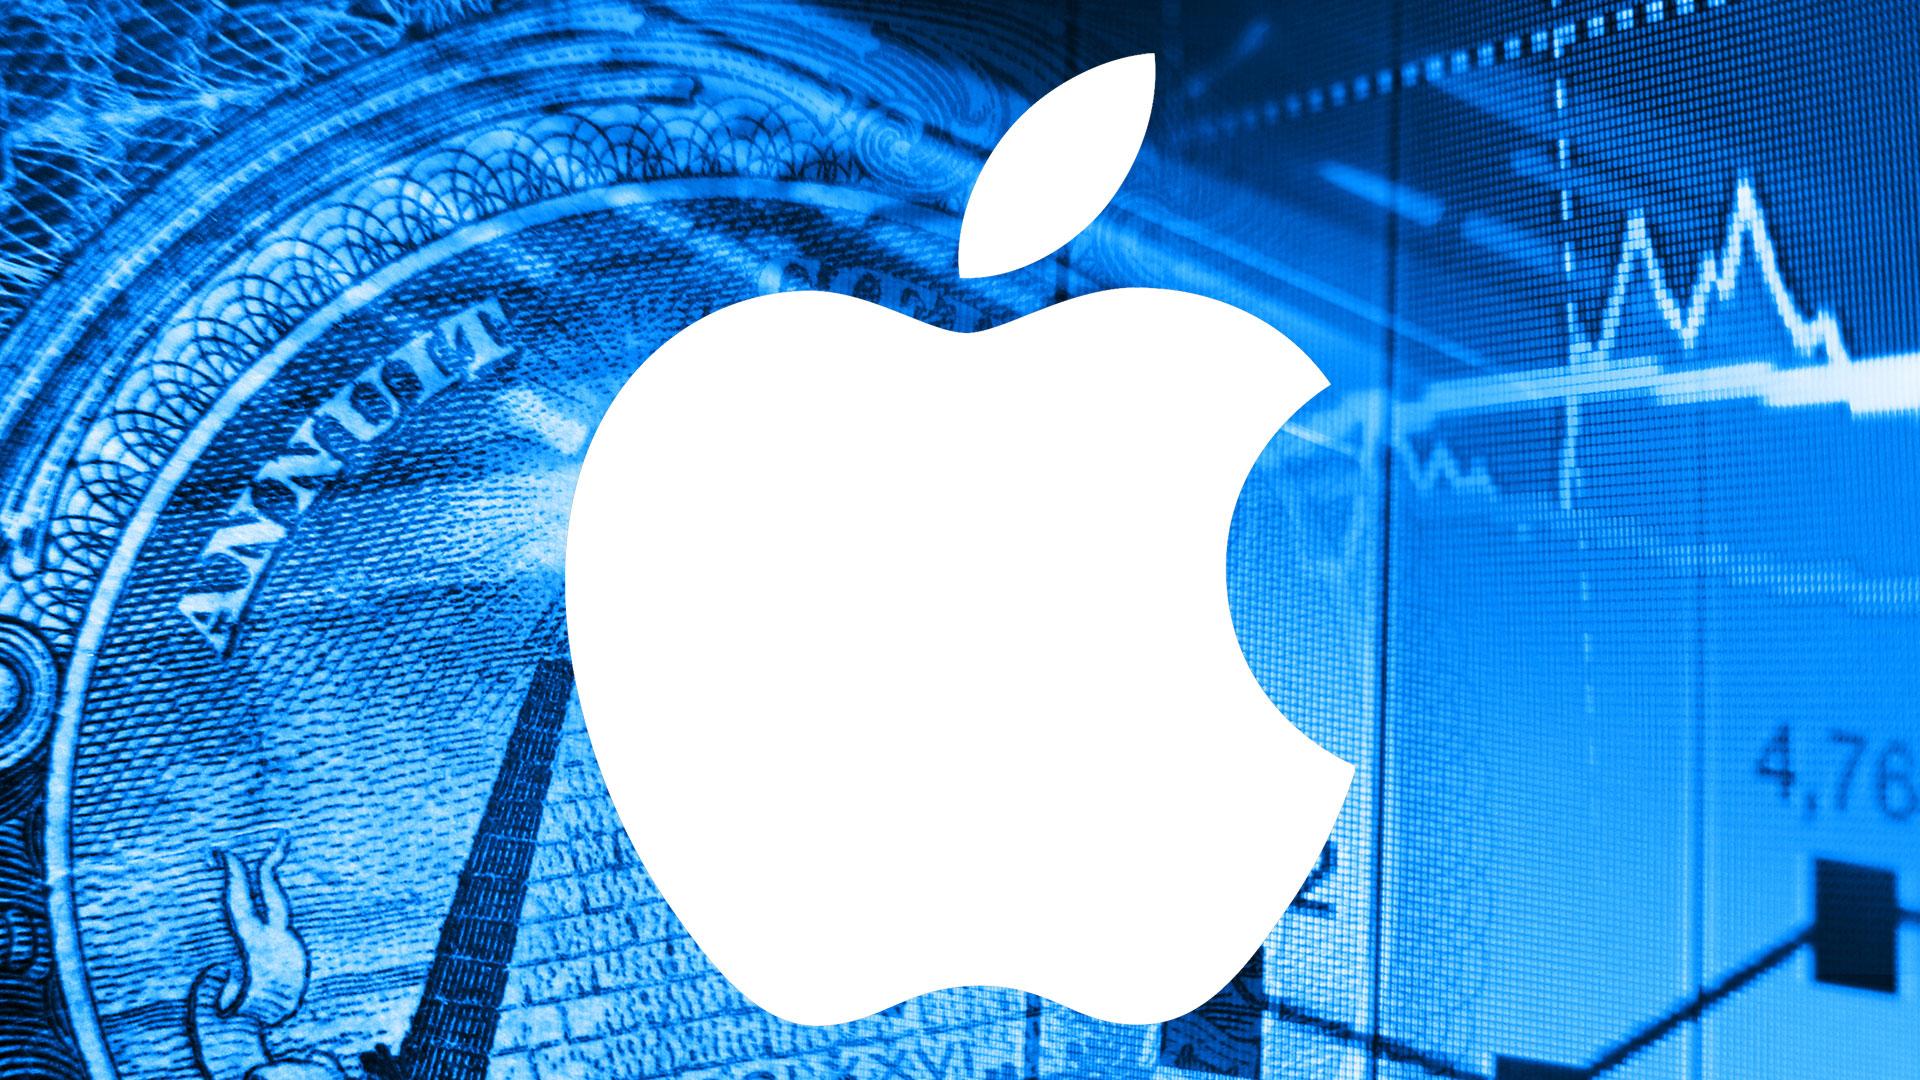 Apple Inc. clipart apple iphone #15